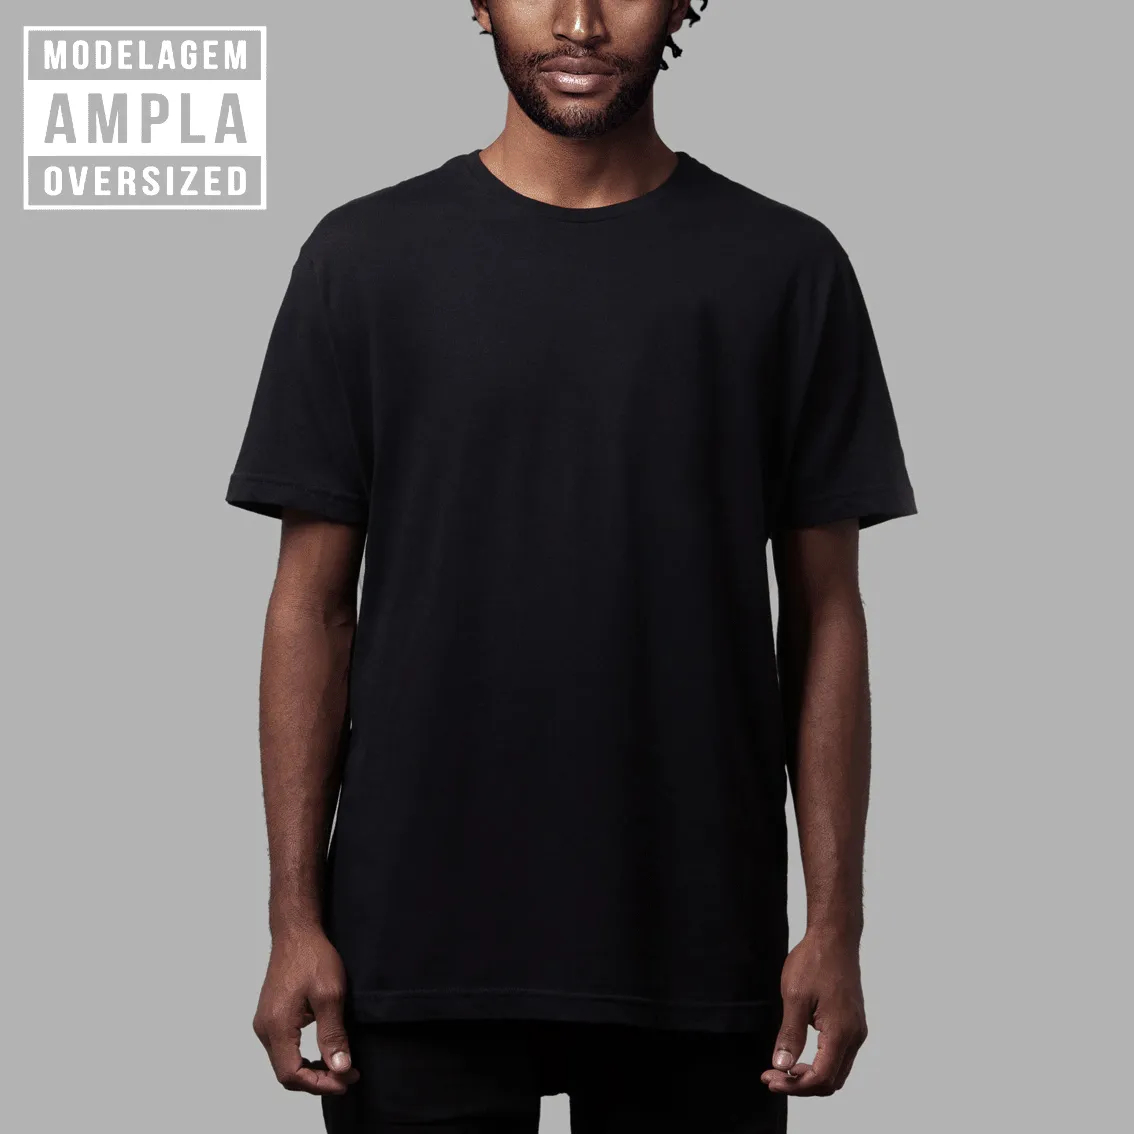 Camiseta Básica Oversized Preta